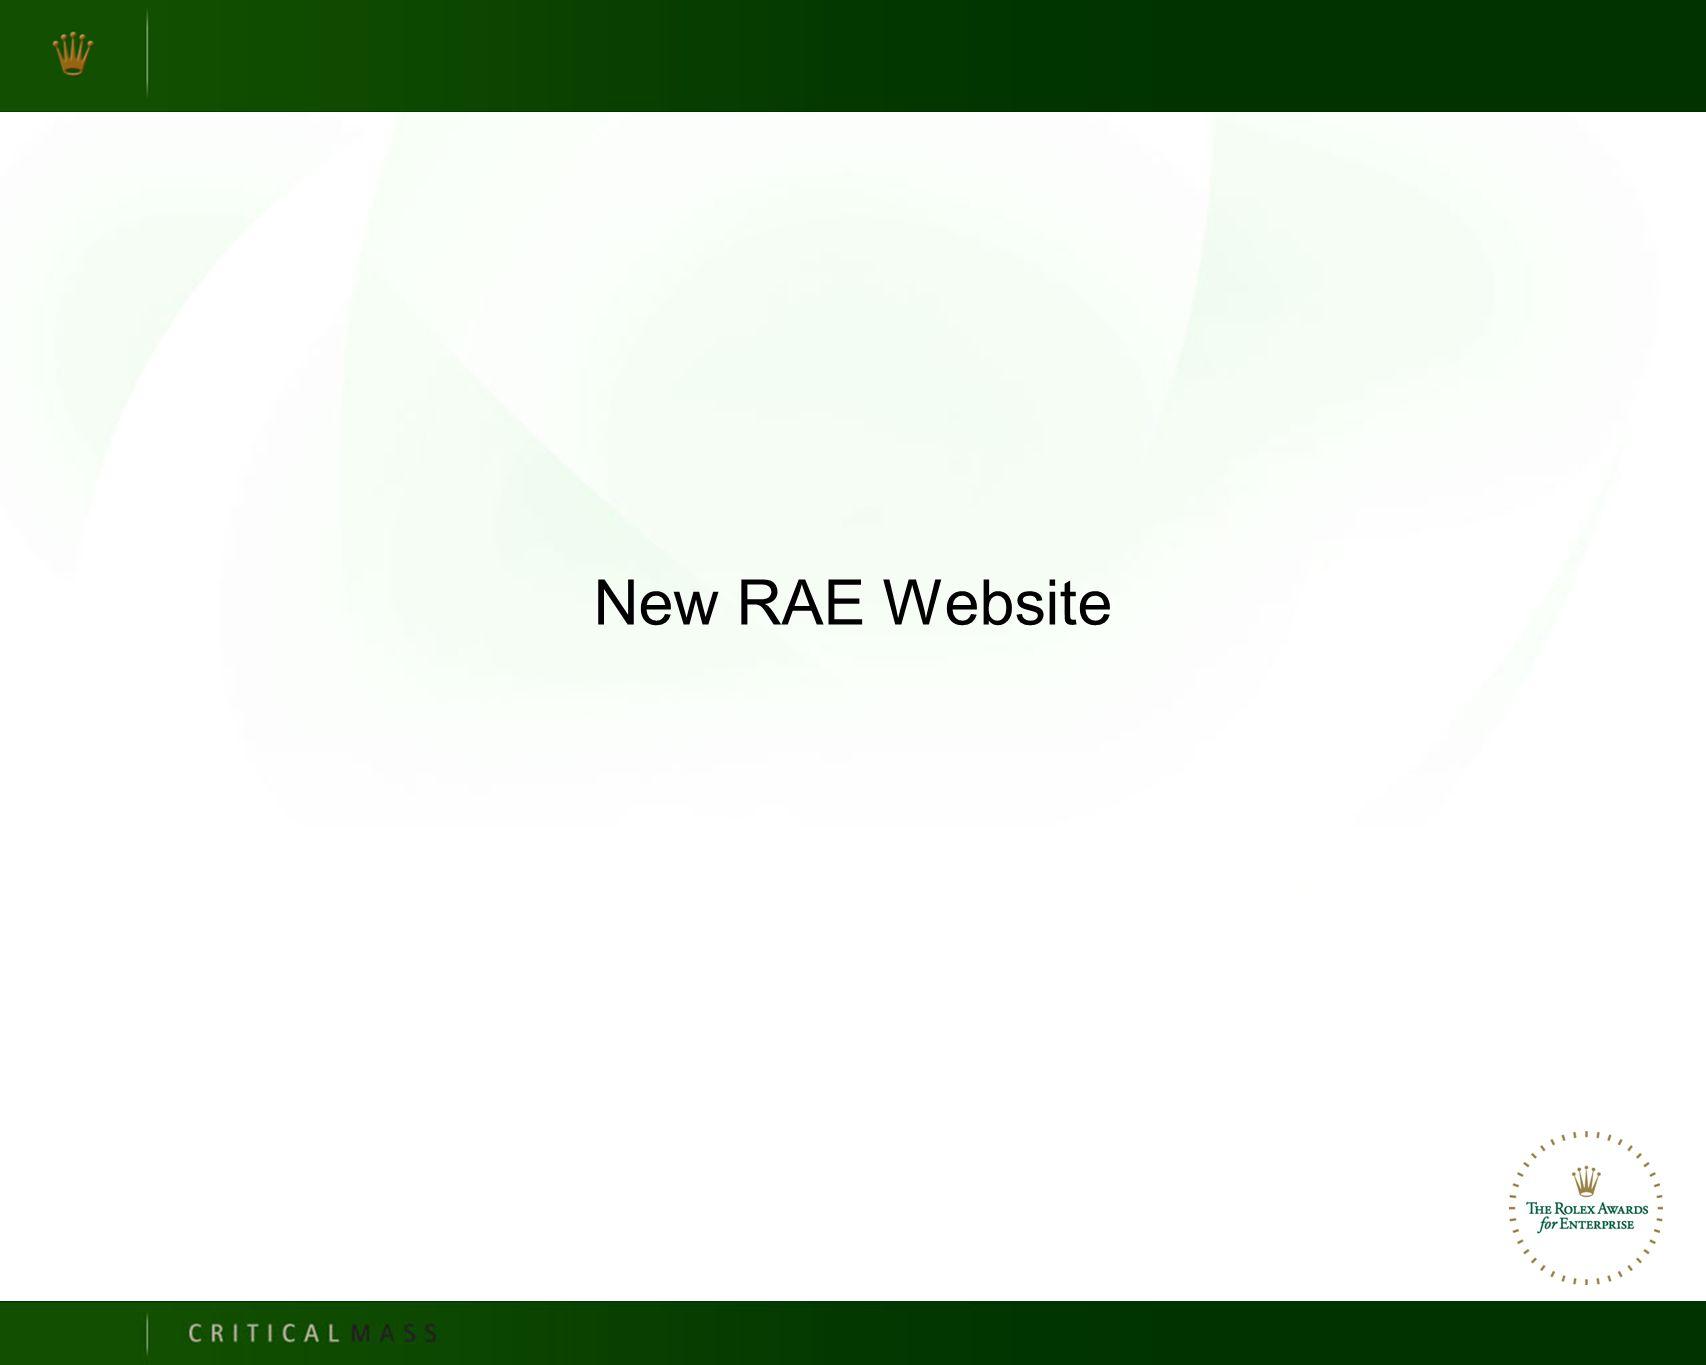 New RAE Website